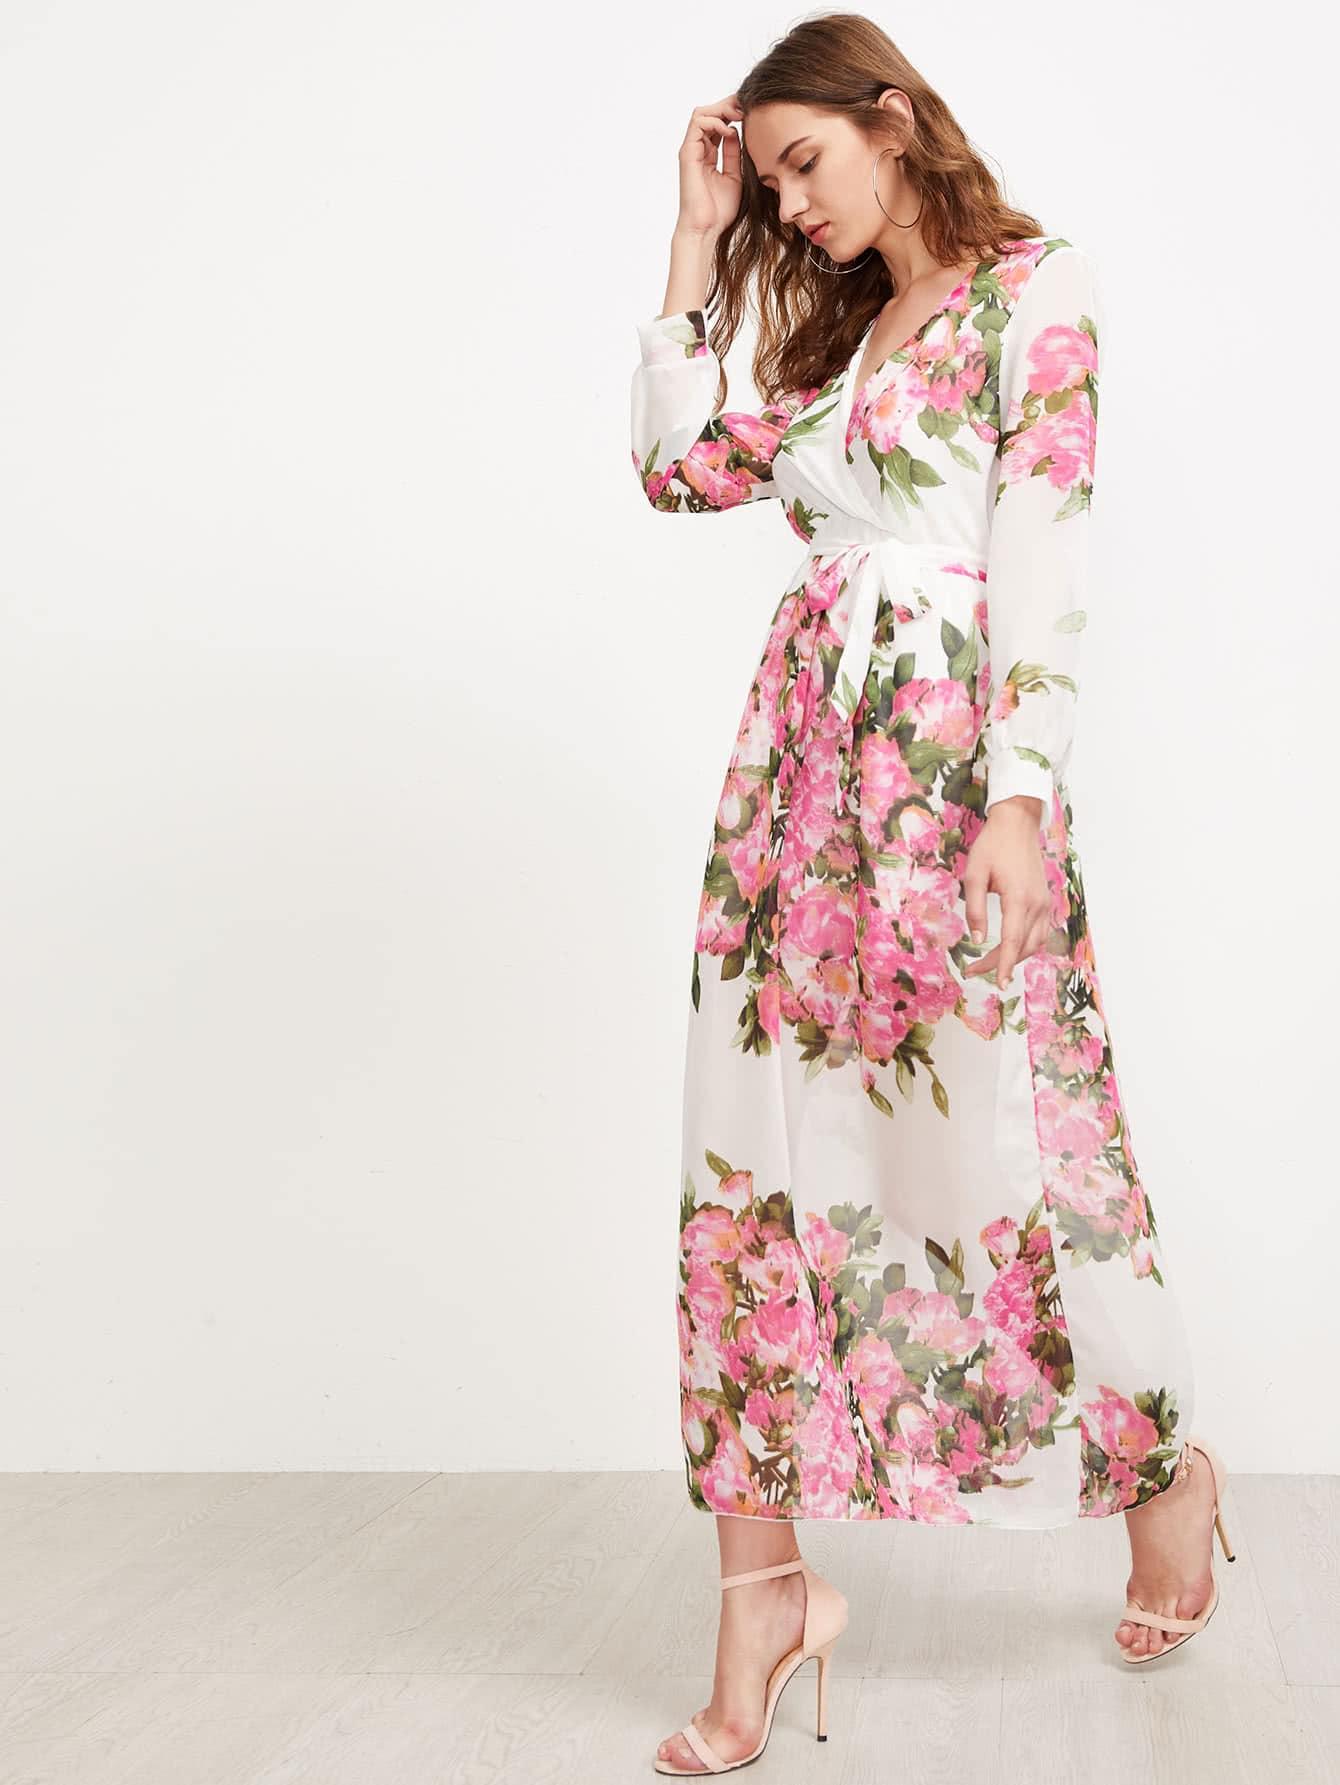 Surplice Neckline Florals Self Tie Chiffon Dress